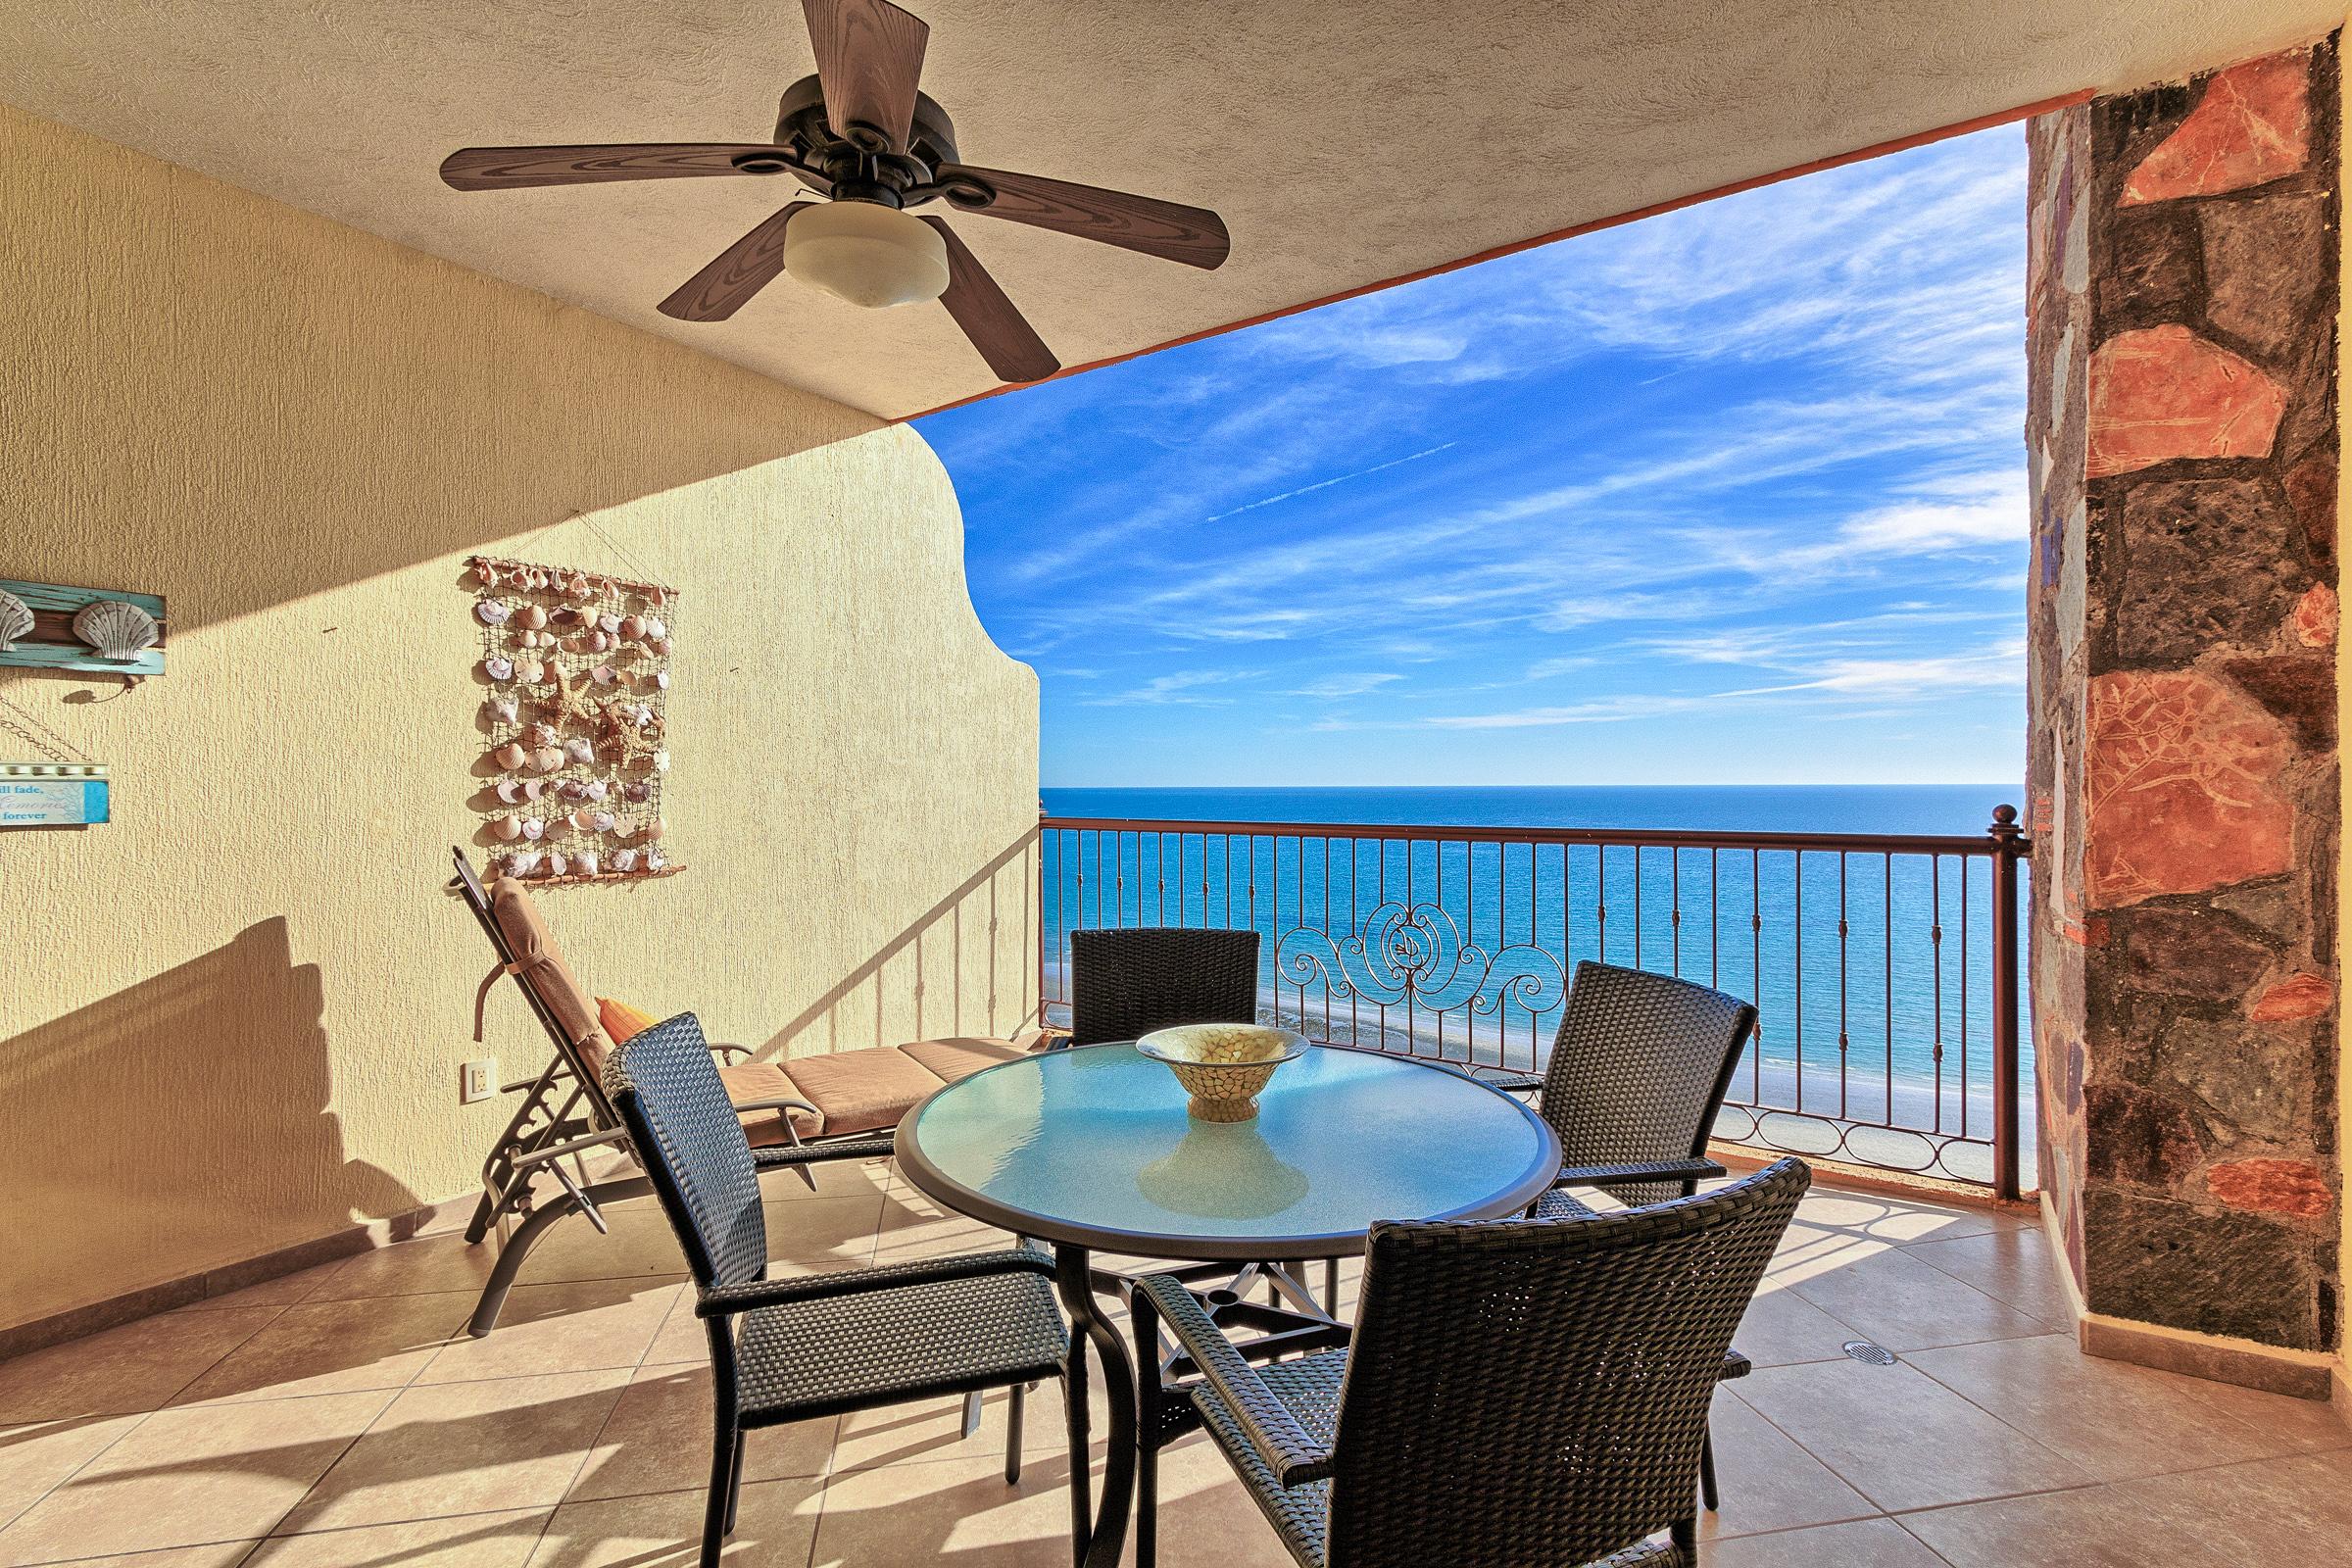 The Sonoran Sky Resort